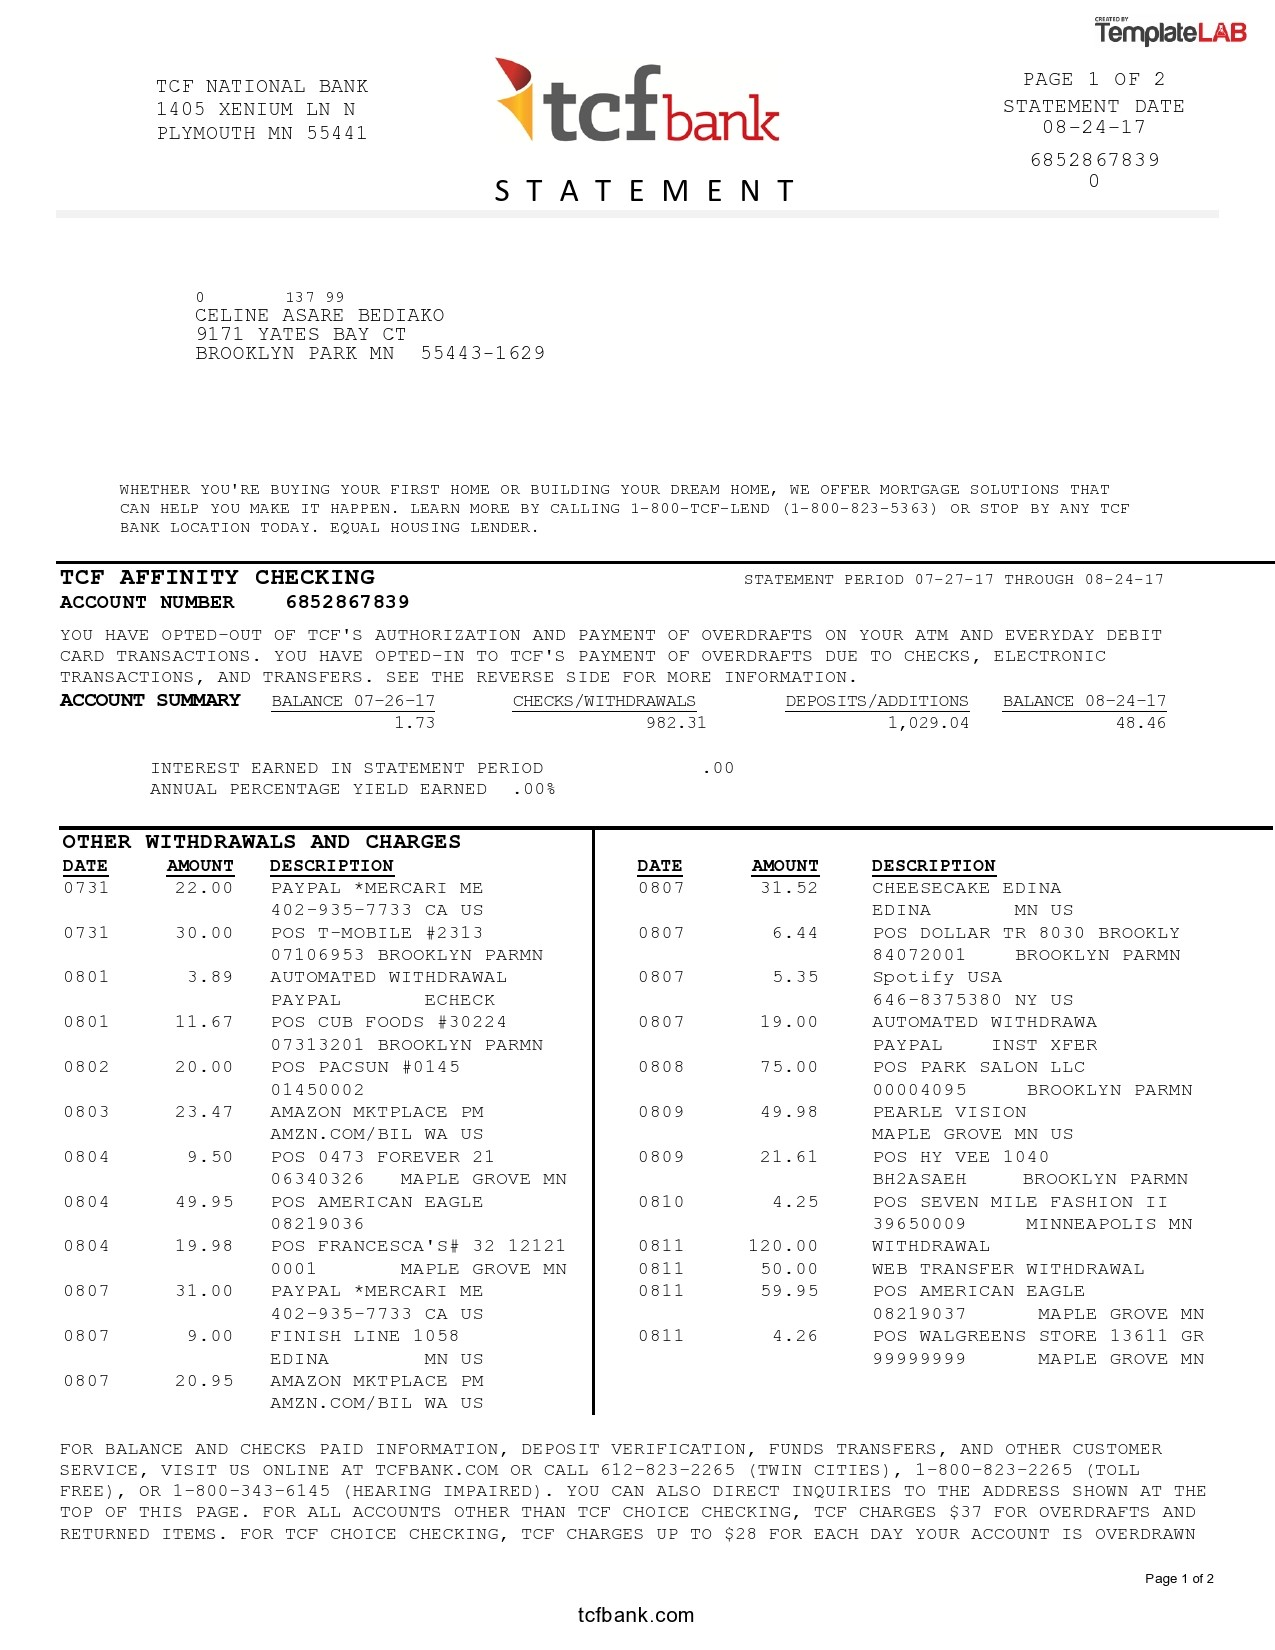 Free TCF Bank Statement - TemplateLab.com